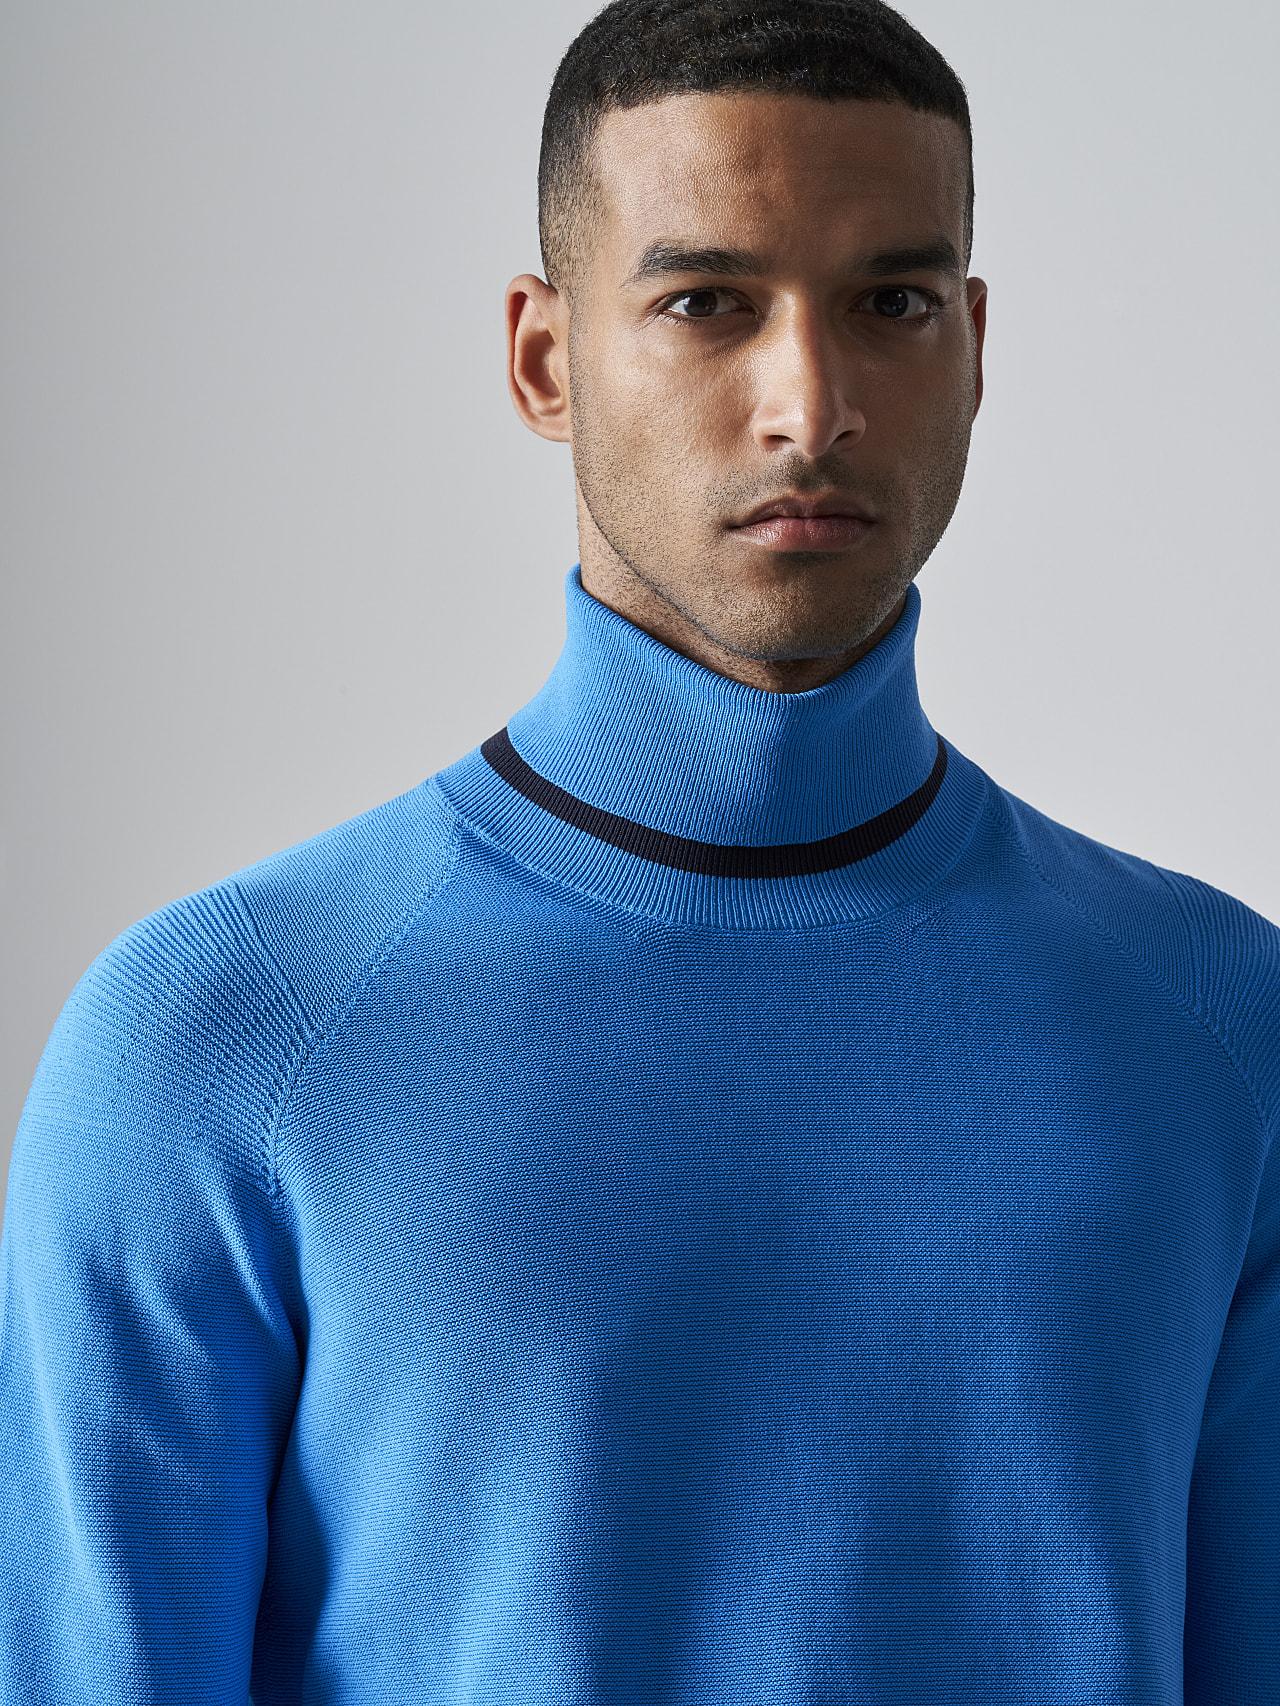 FUZZO V1.Y5.02 Seamless 3D Knit Roll-Neck Jumper blue Right Alpha Tauri